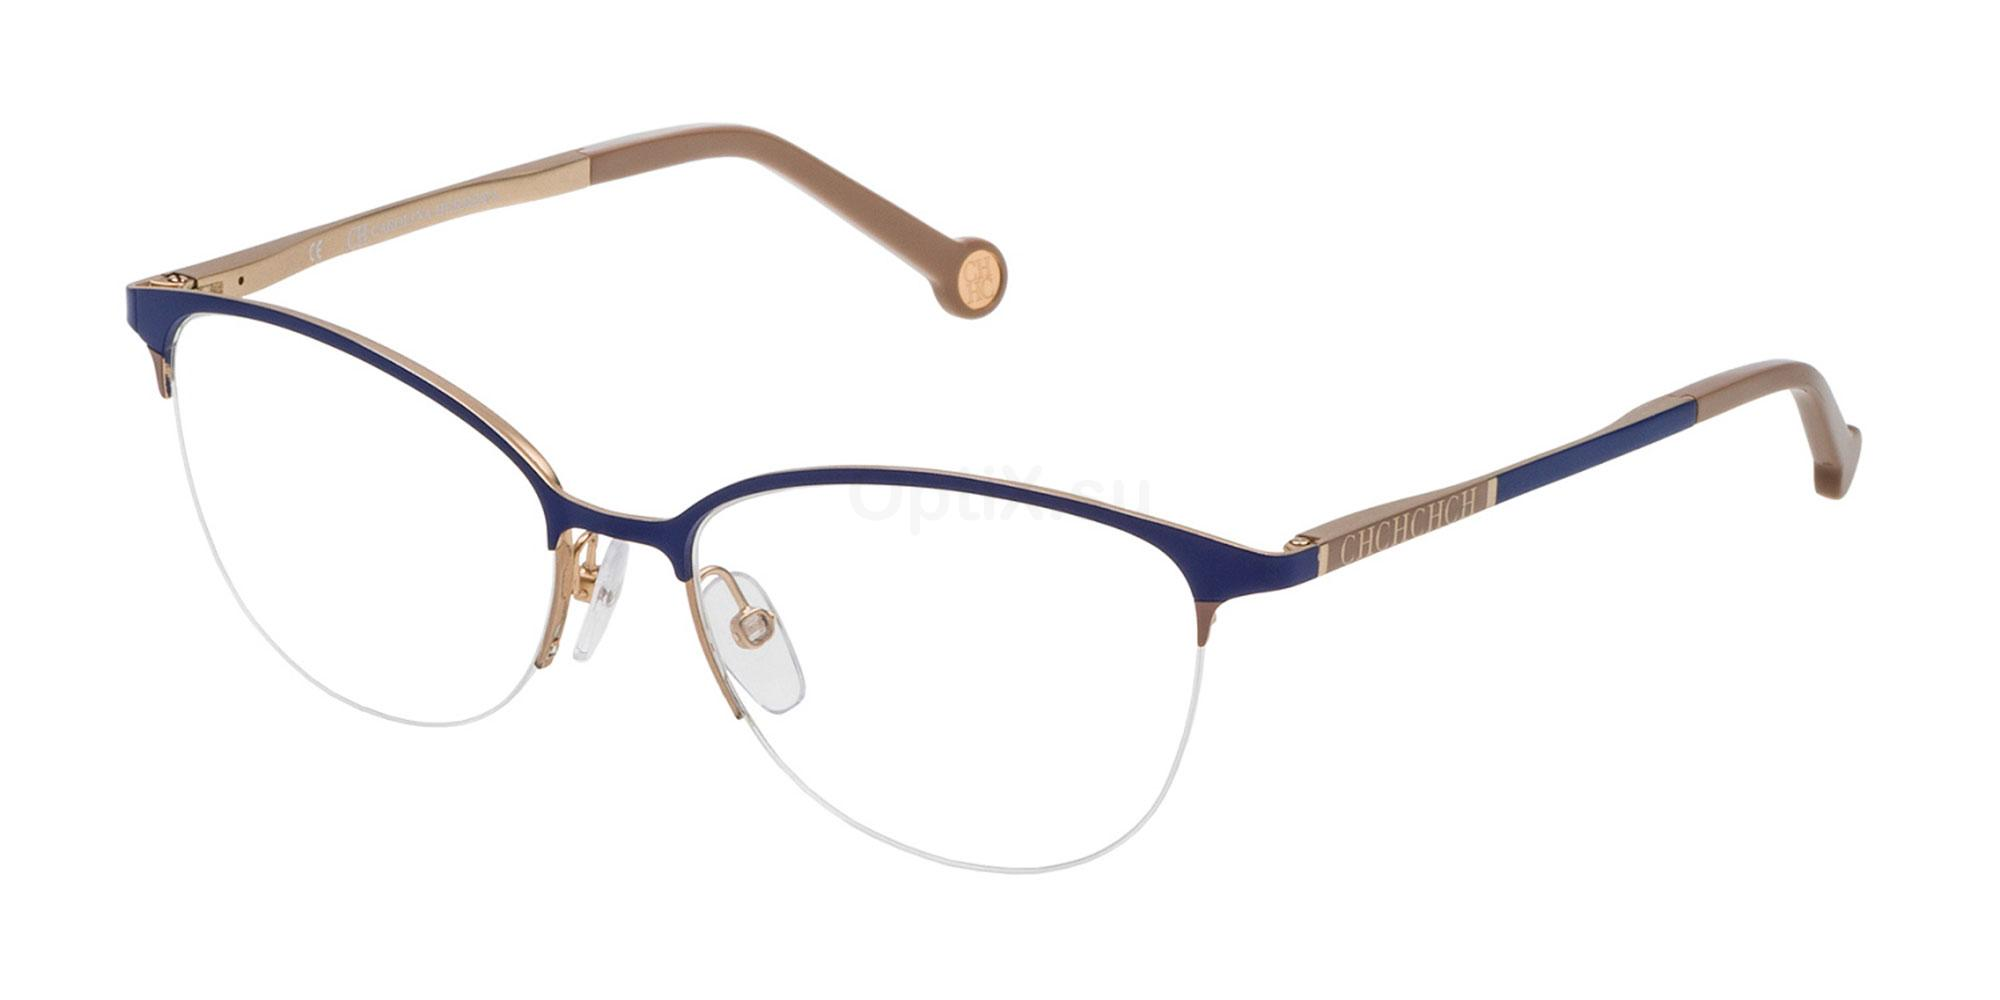 317M VHE093 Glasses, CH Carolina Herrera